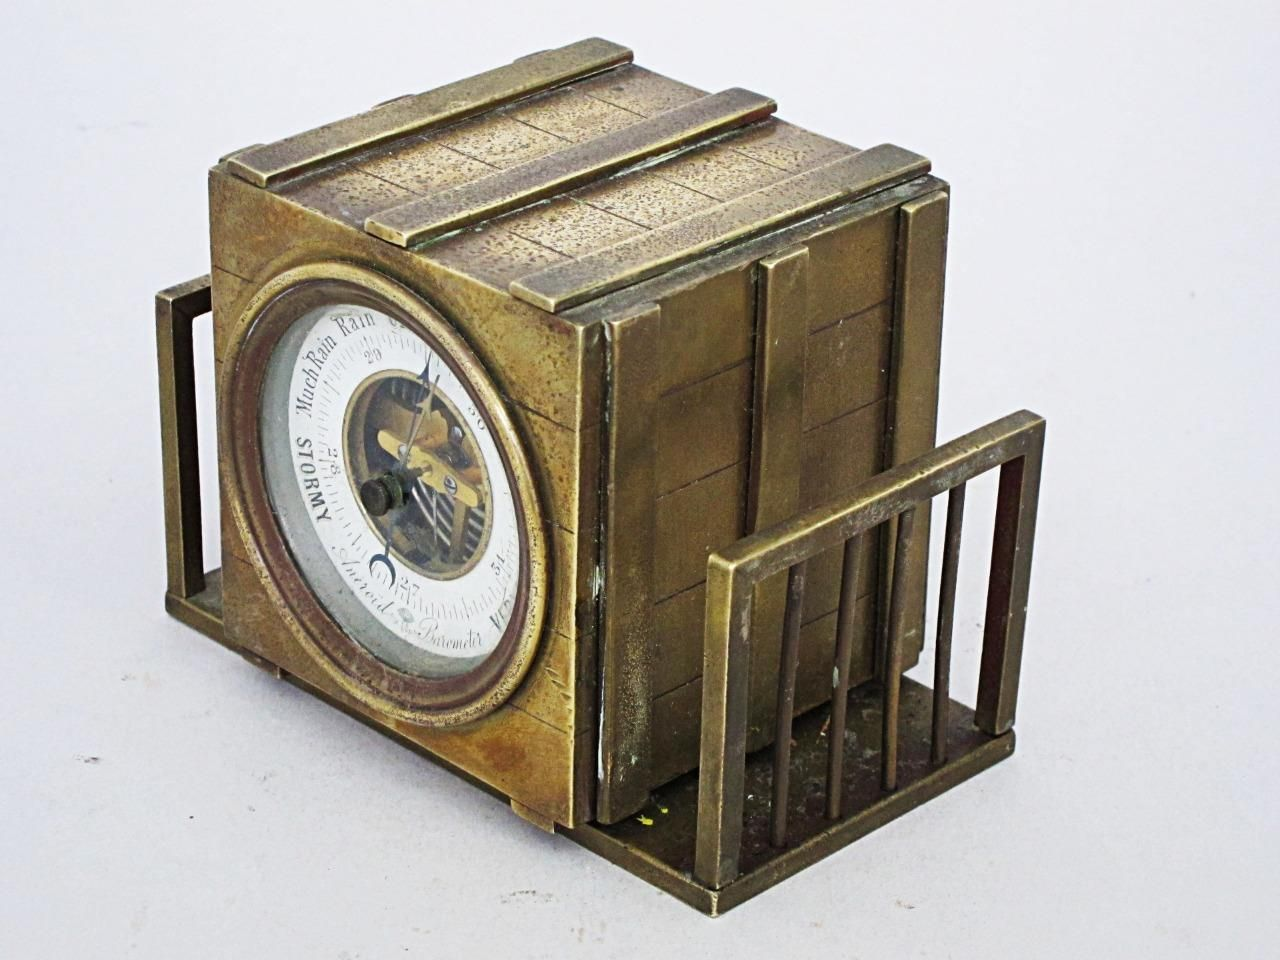 Unusual Desks most unusual antique brass desk top barometer 1880 packing crate